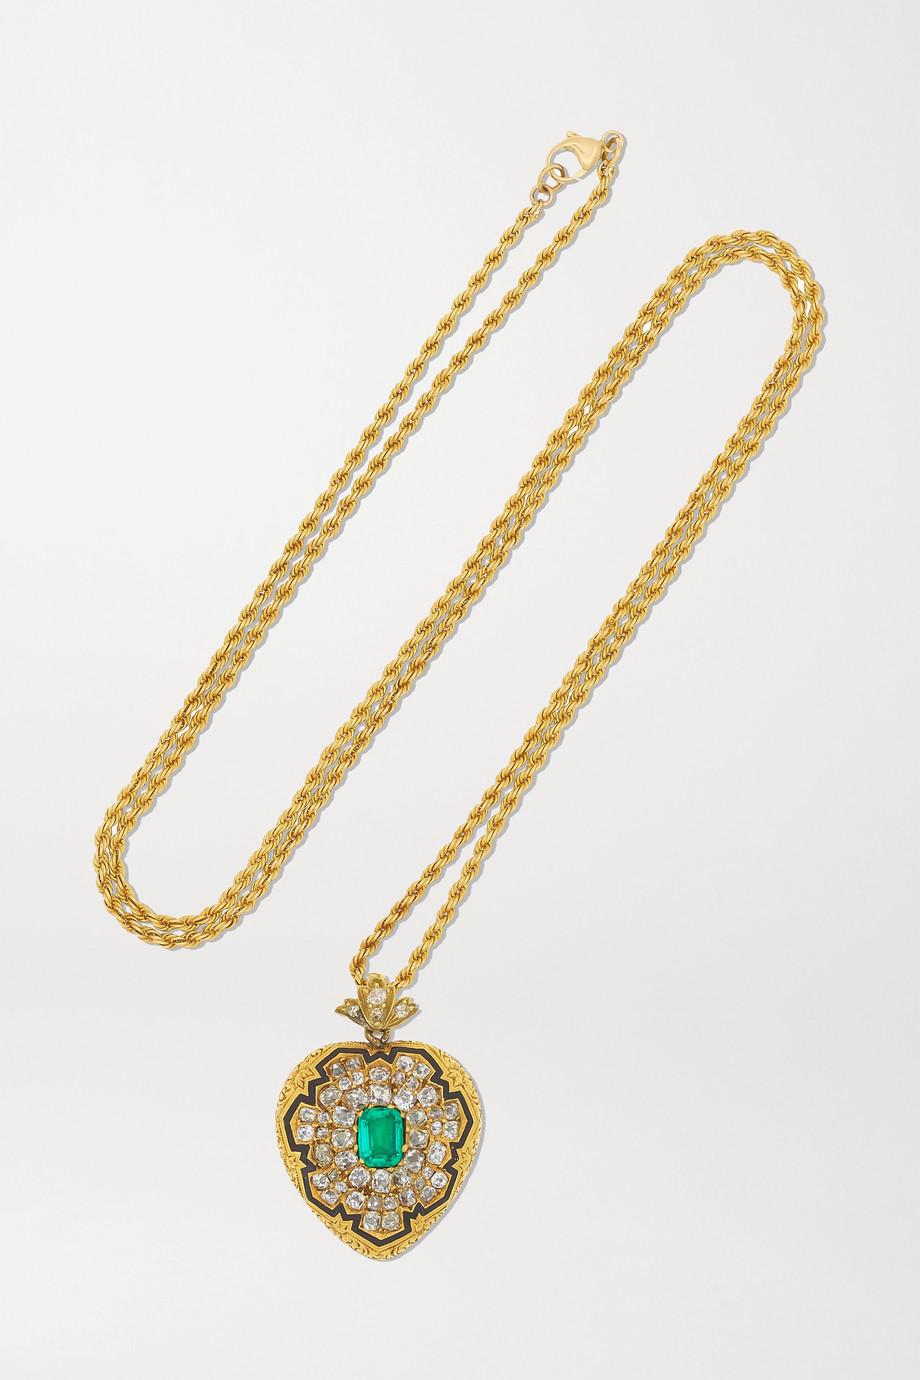 Fred Leighton Antique 18-karat gold, diamond, emerald and enamel necklace